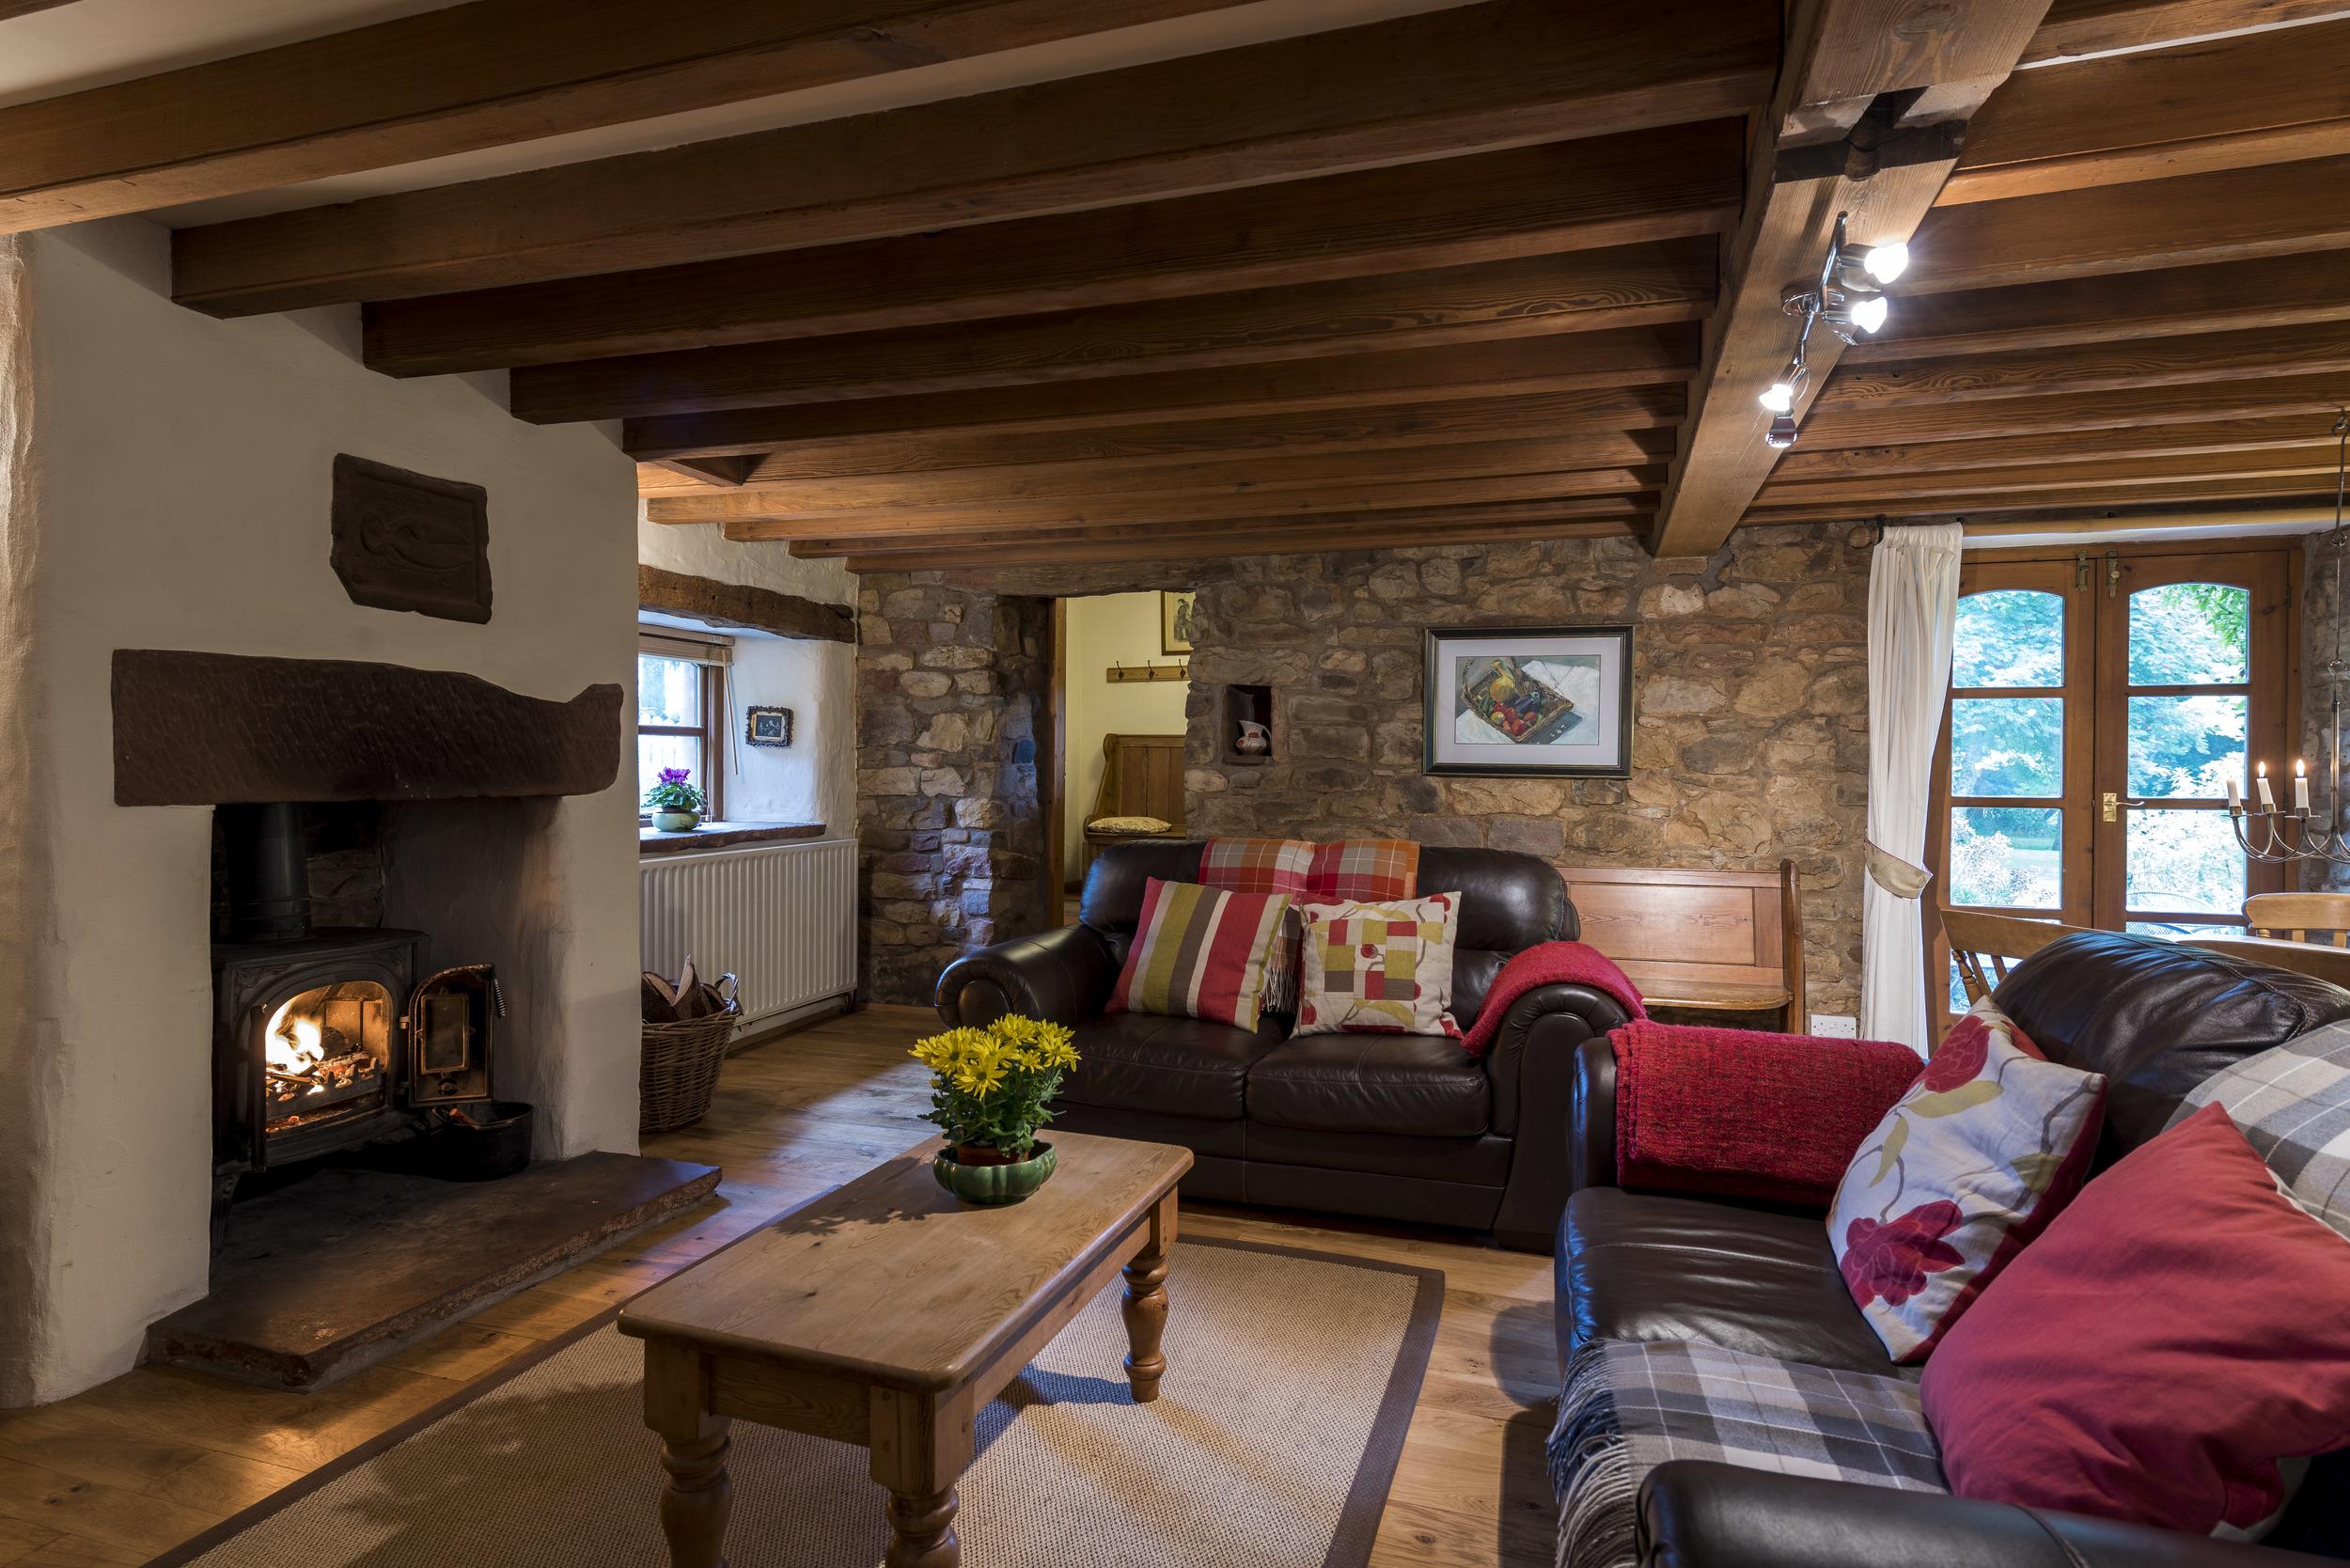 Kirkland_Hall_Cottages-100.jpg